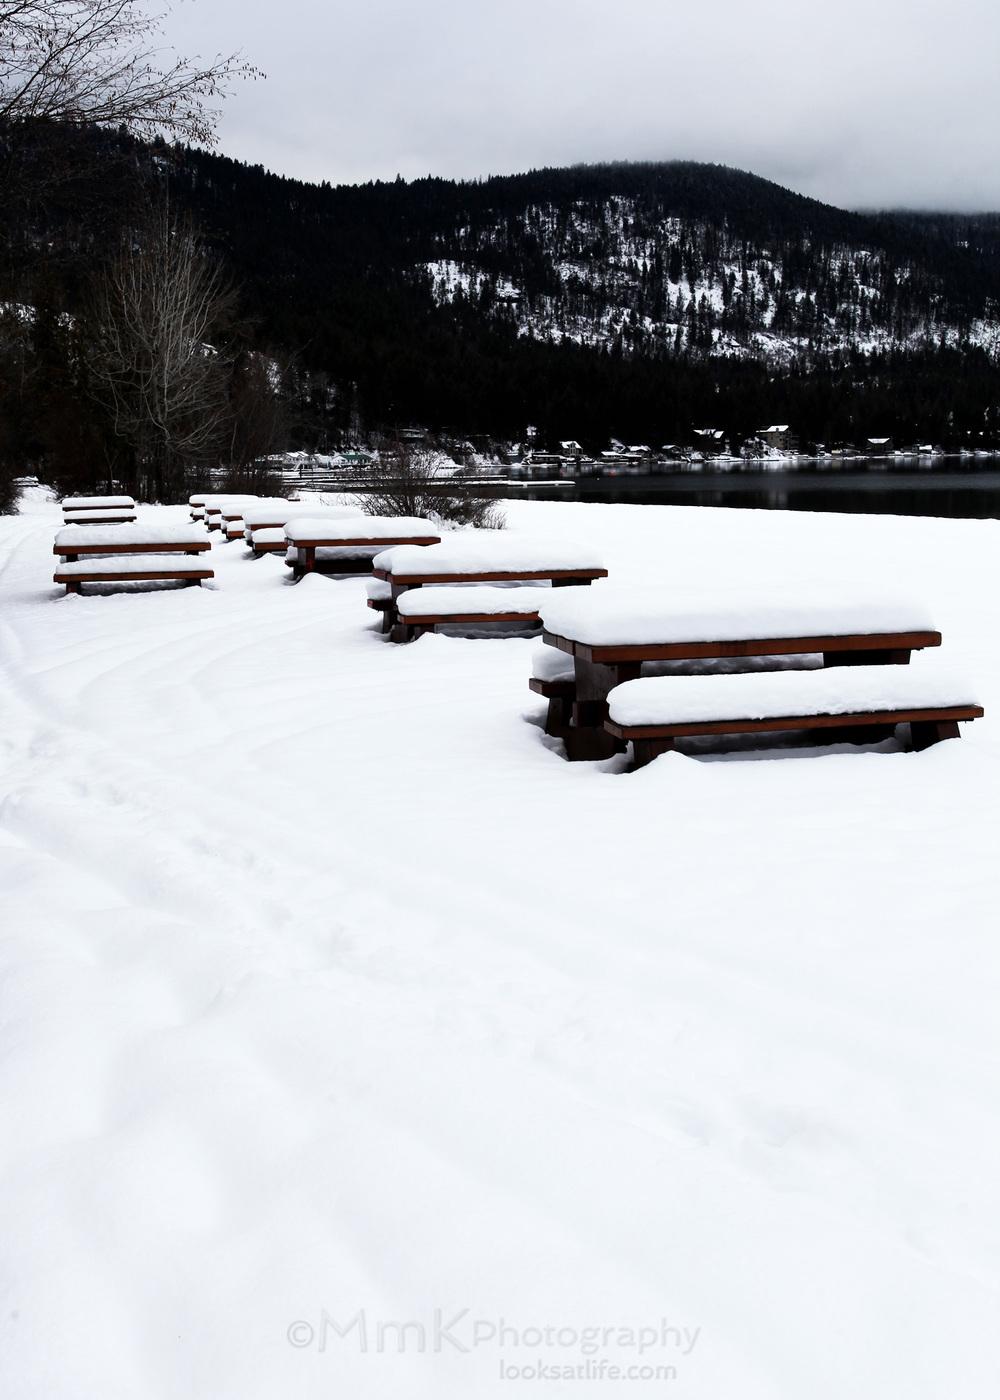 Picnic tables waiting for the spring melt - Christina Lake, BC.